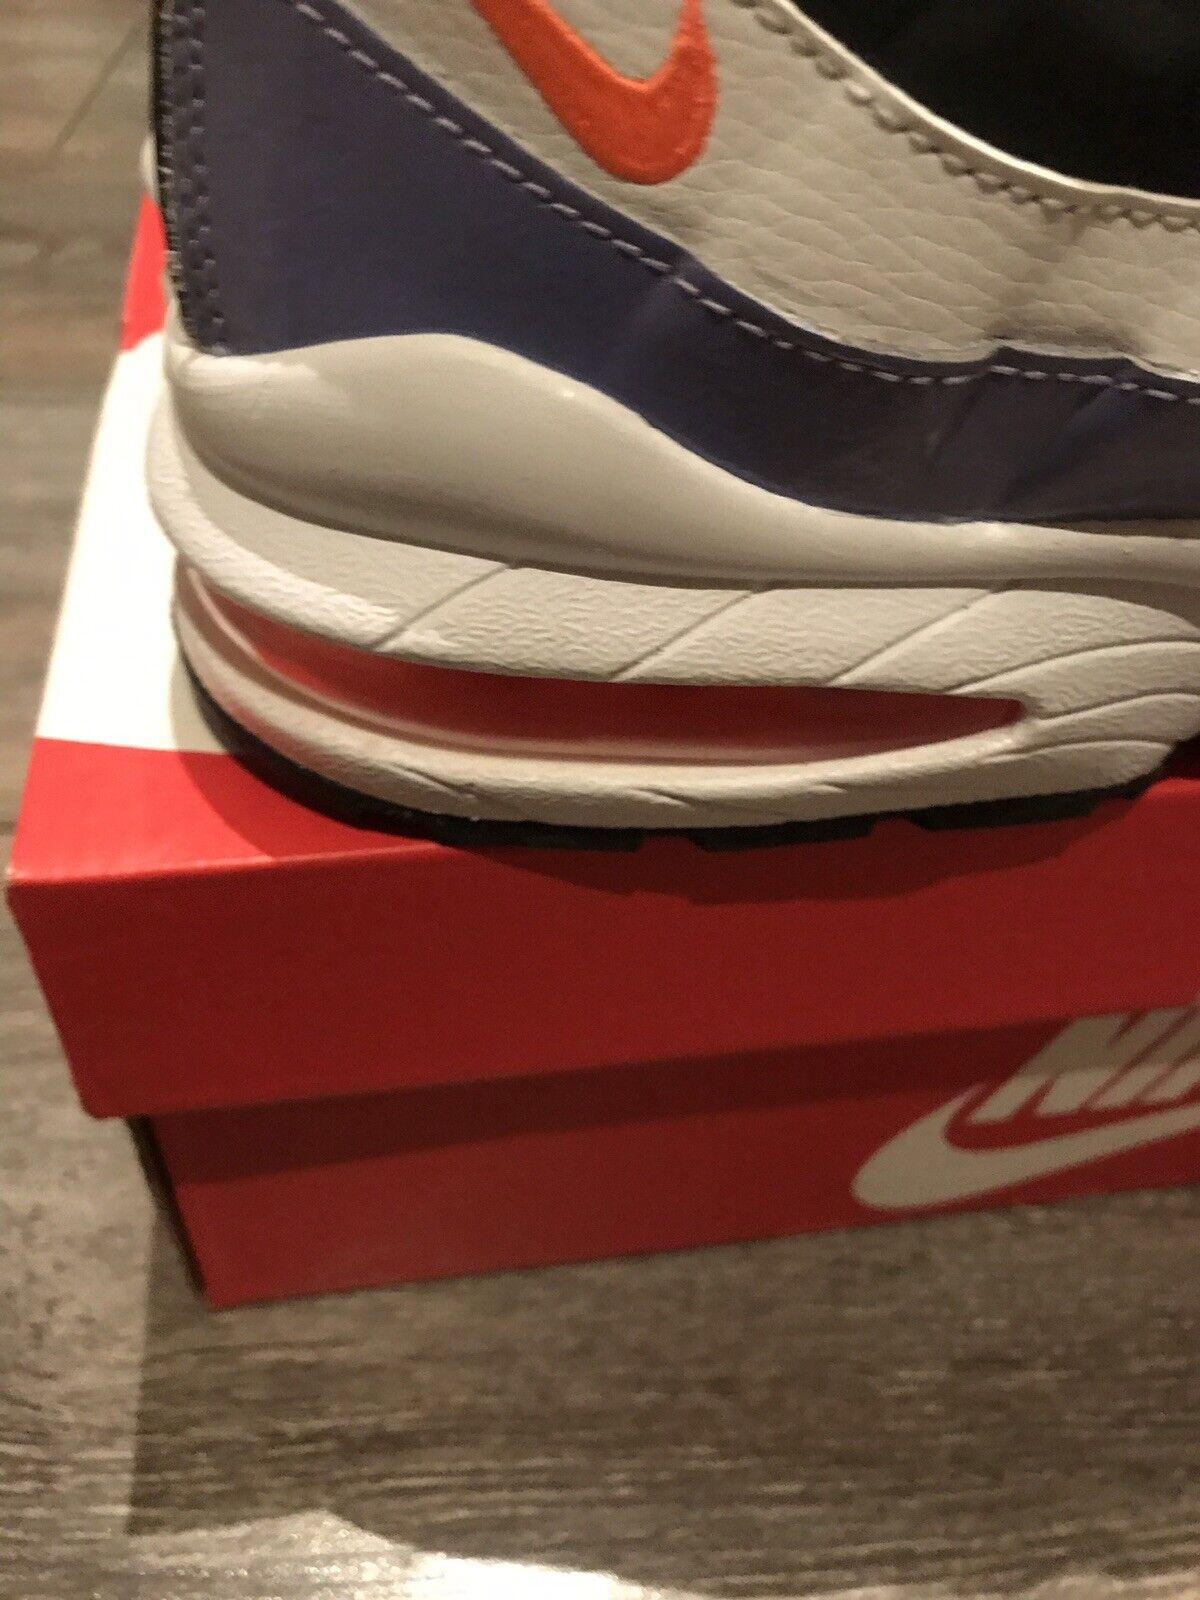 Brand New New New Nike Air Max 95 UK 5.5 bb8c58